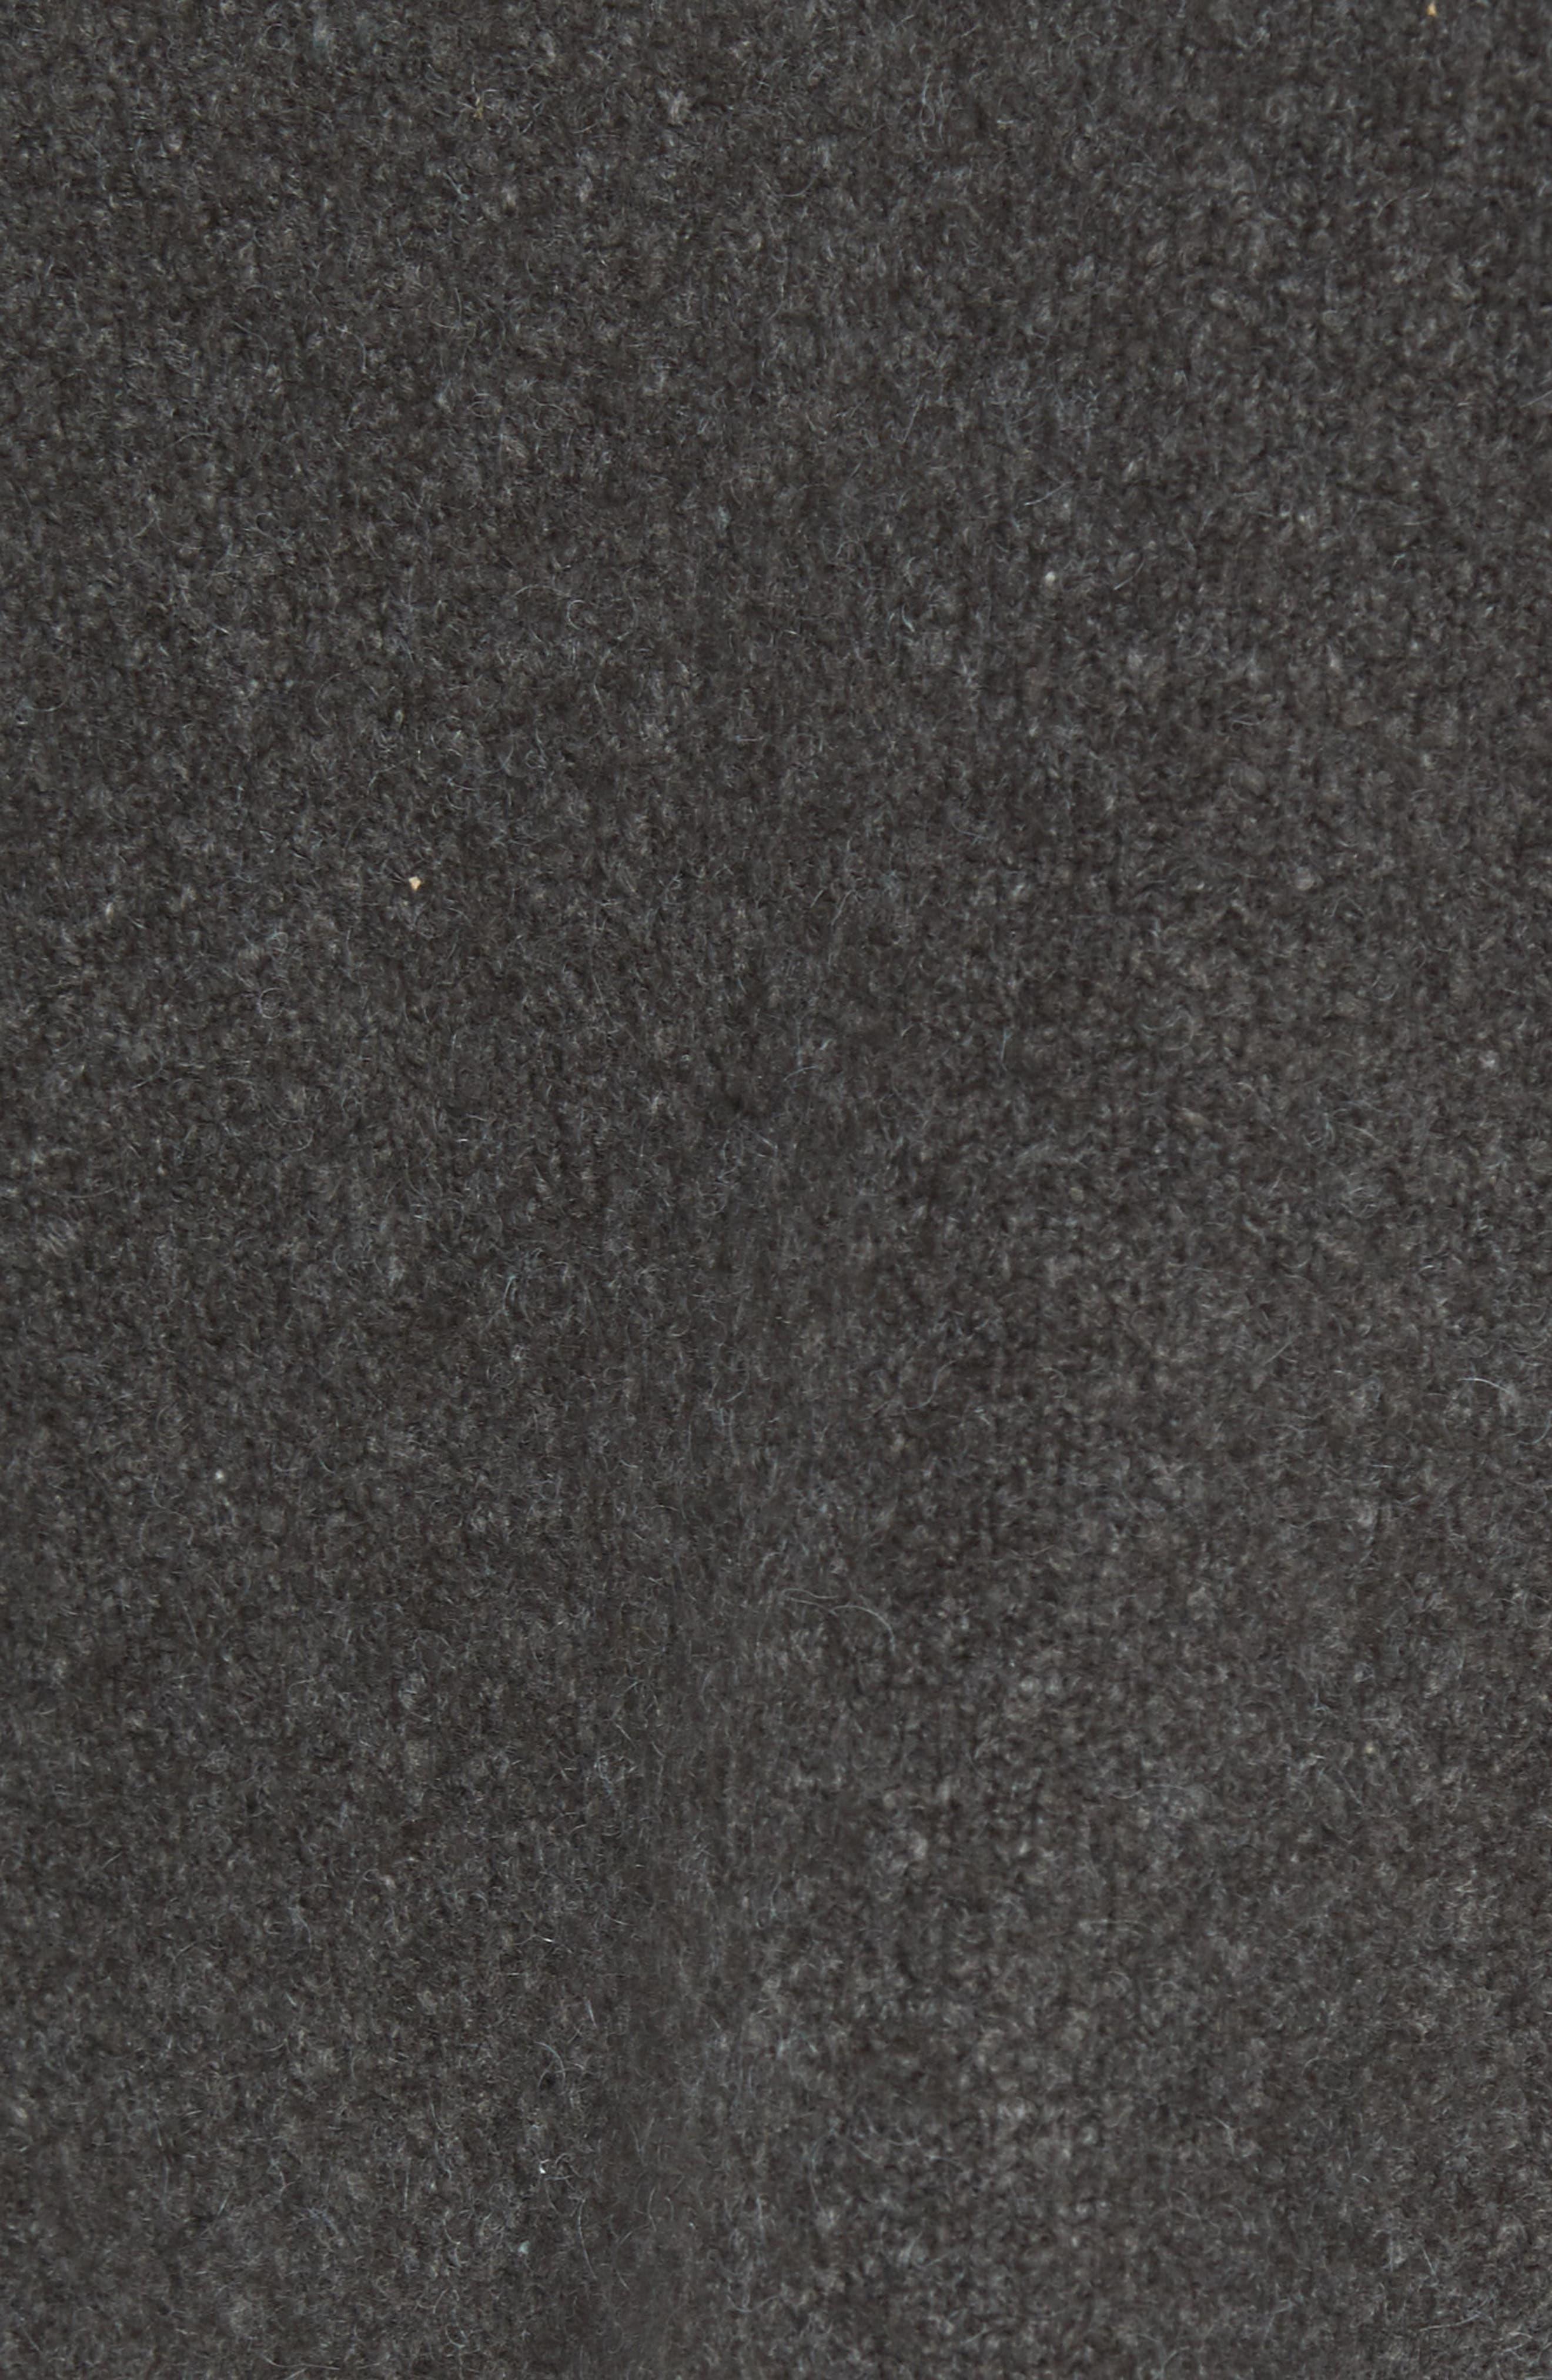 Urban Flossy Sweater,                             Alternate thumbnail 19, color,